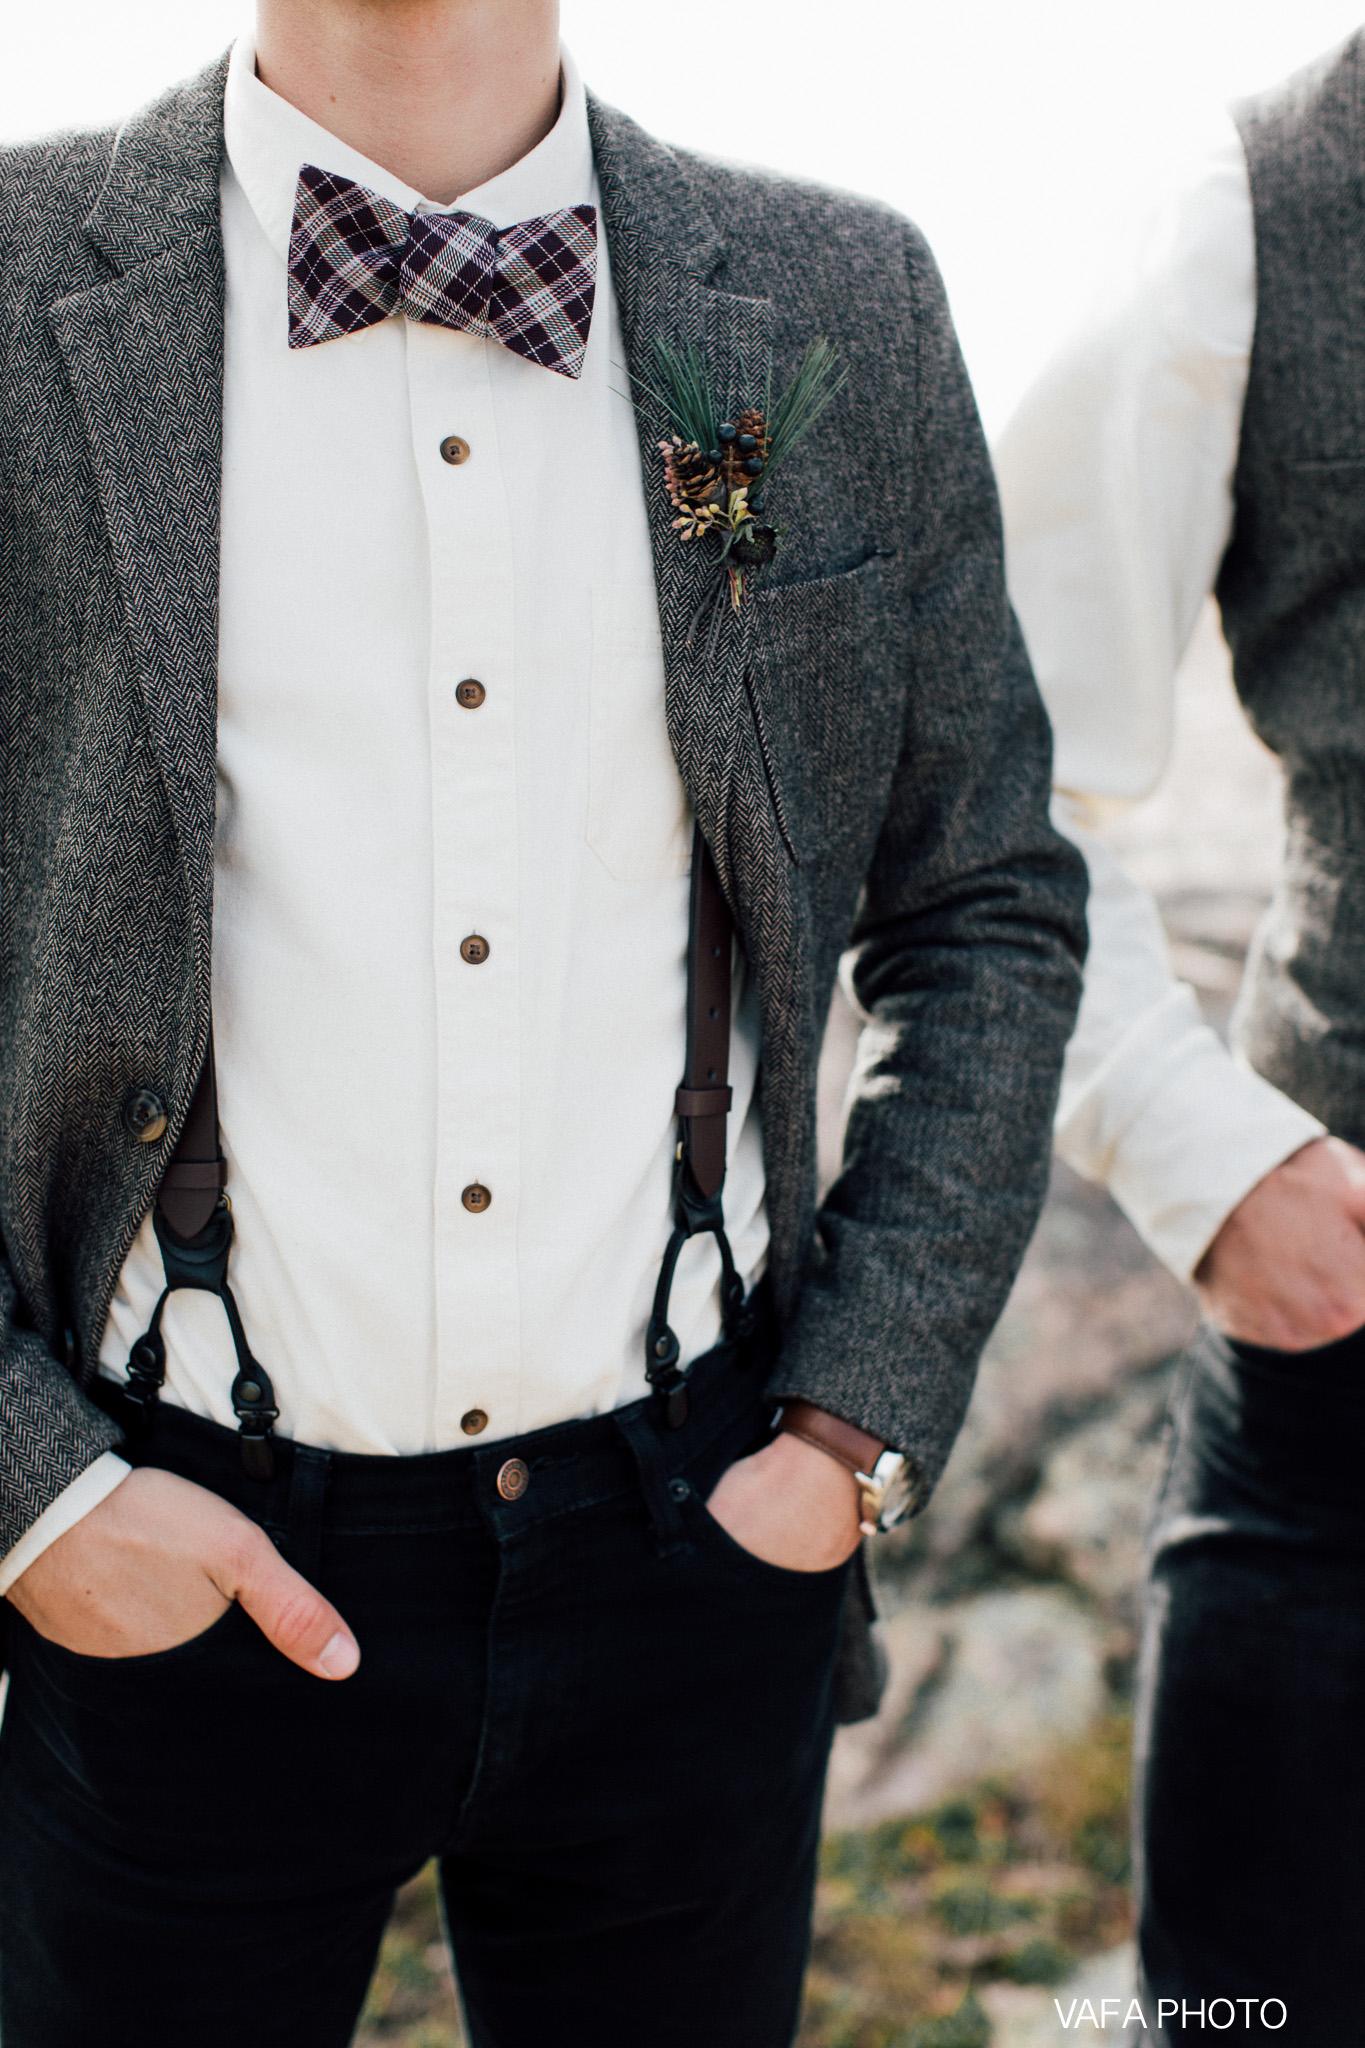 Hogback-Mountain-Wedding-Chelsea-Josh-Vafa-Photo-339.jpg